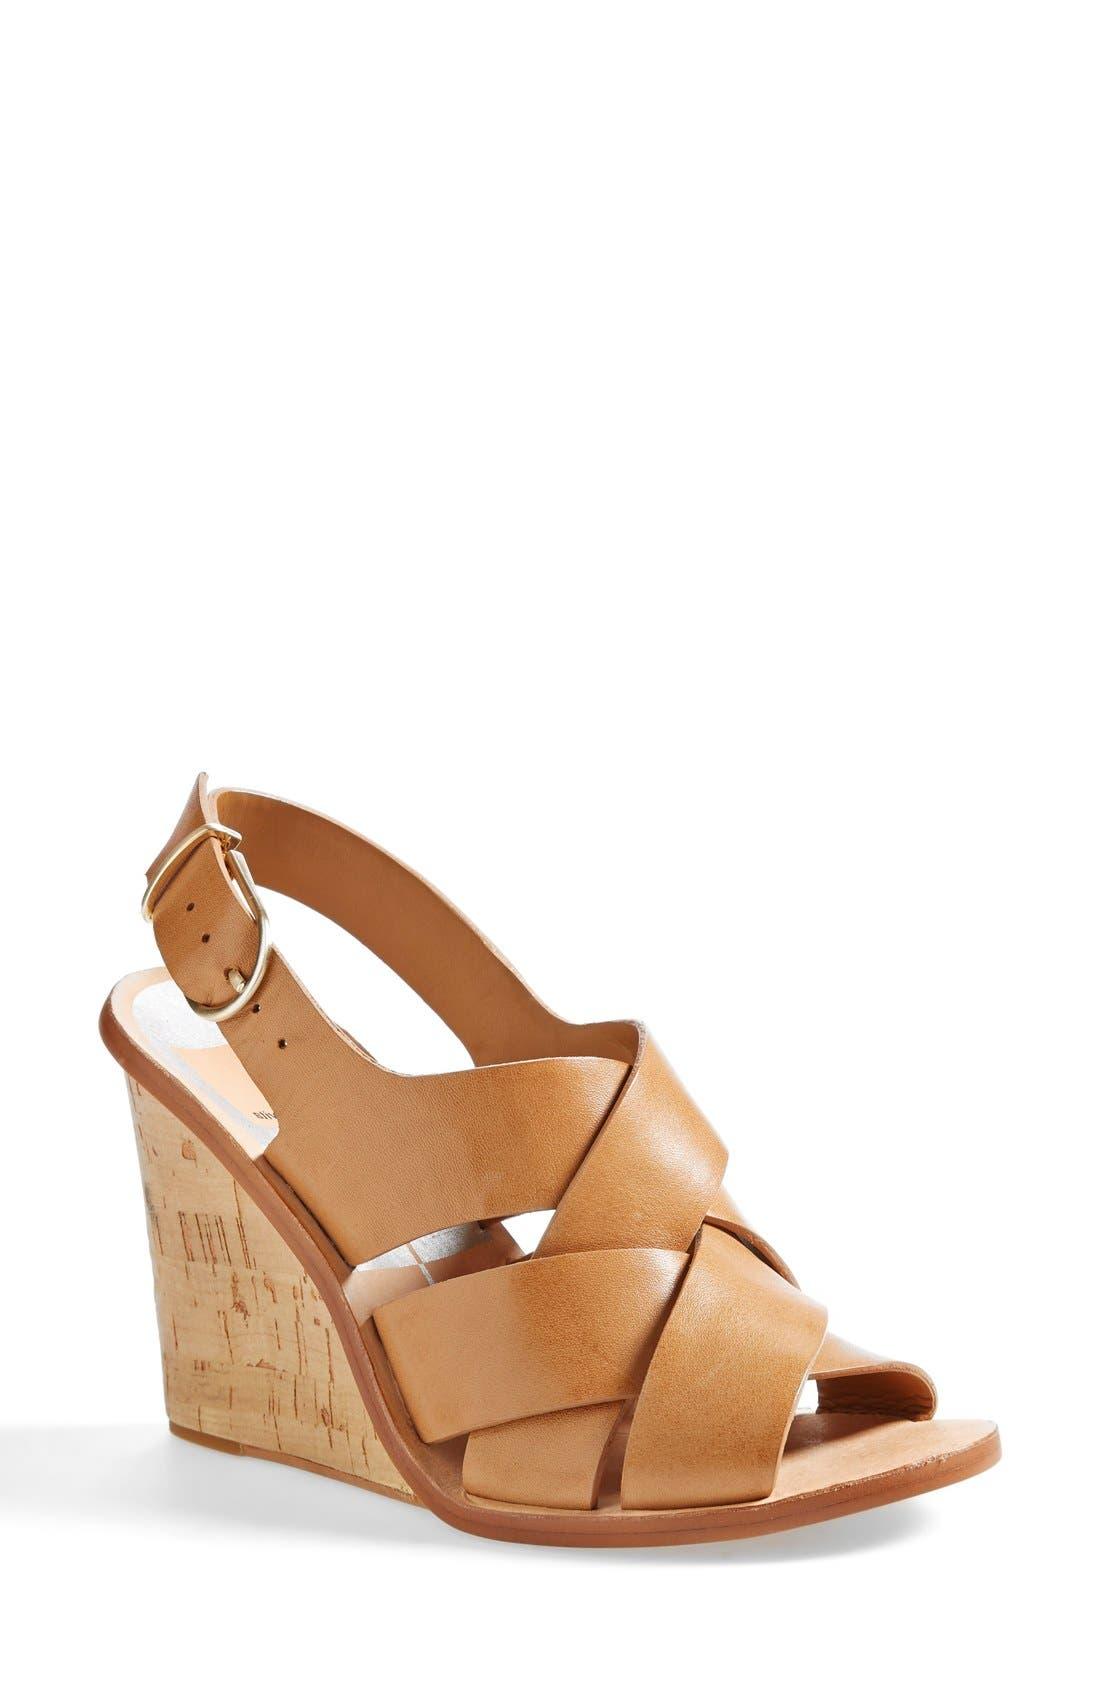 Main Image - Dolce Vita 'Remie' Sandal (Women)